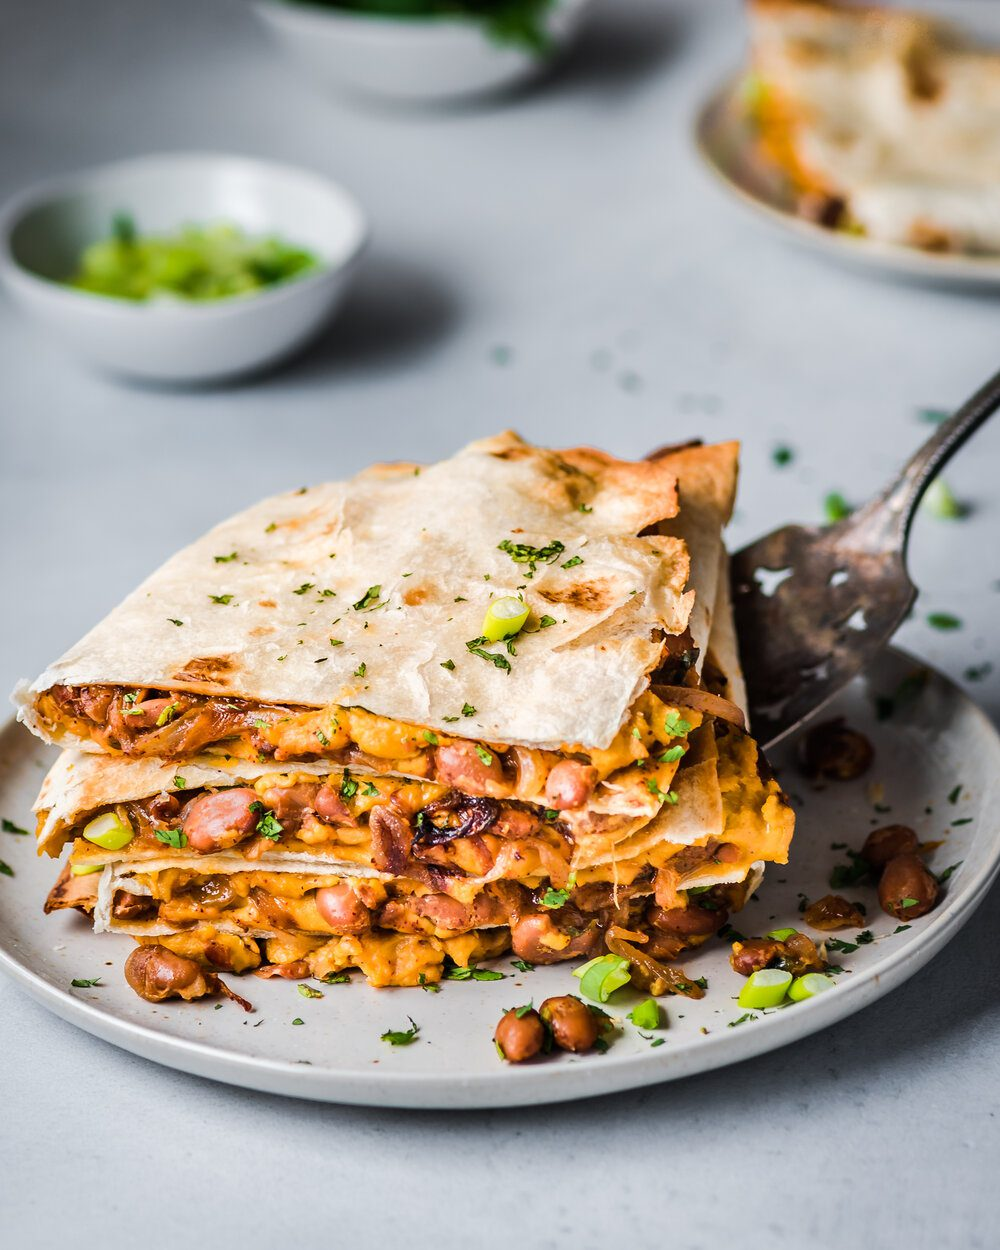 Vegan Quesadillas with Smoky Cheese and Refried Beans. Quesadillas food photography. pantry vegan Quesadillas.